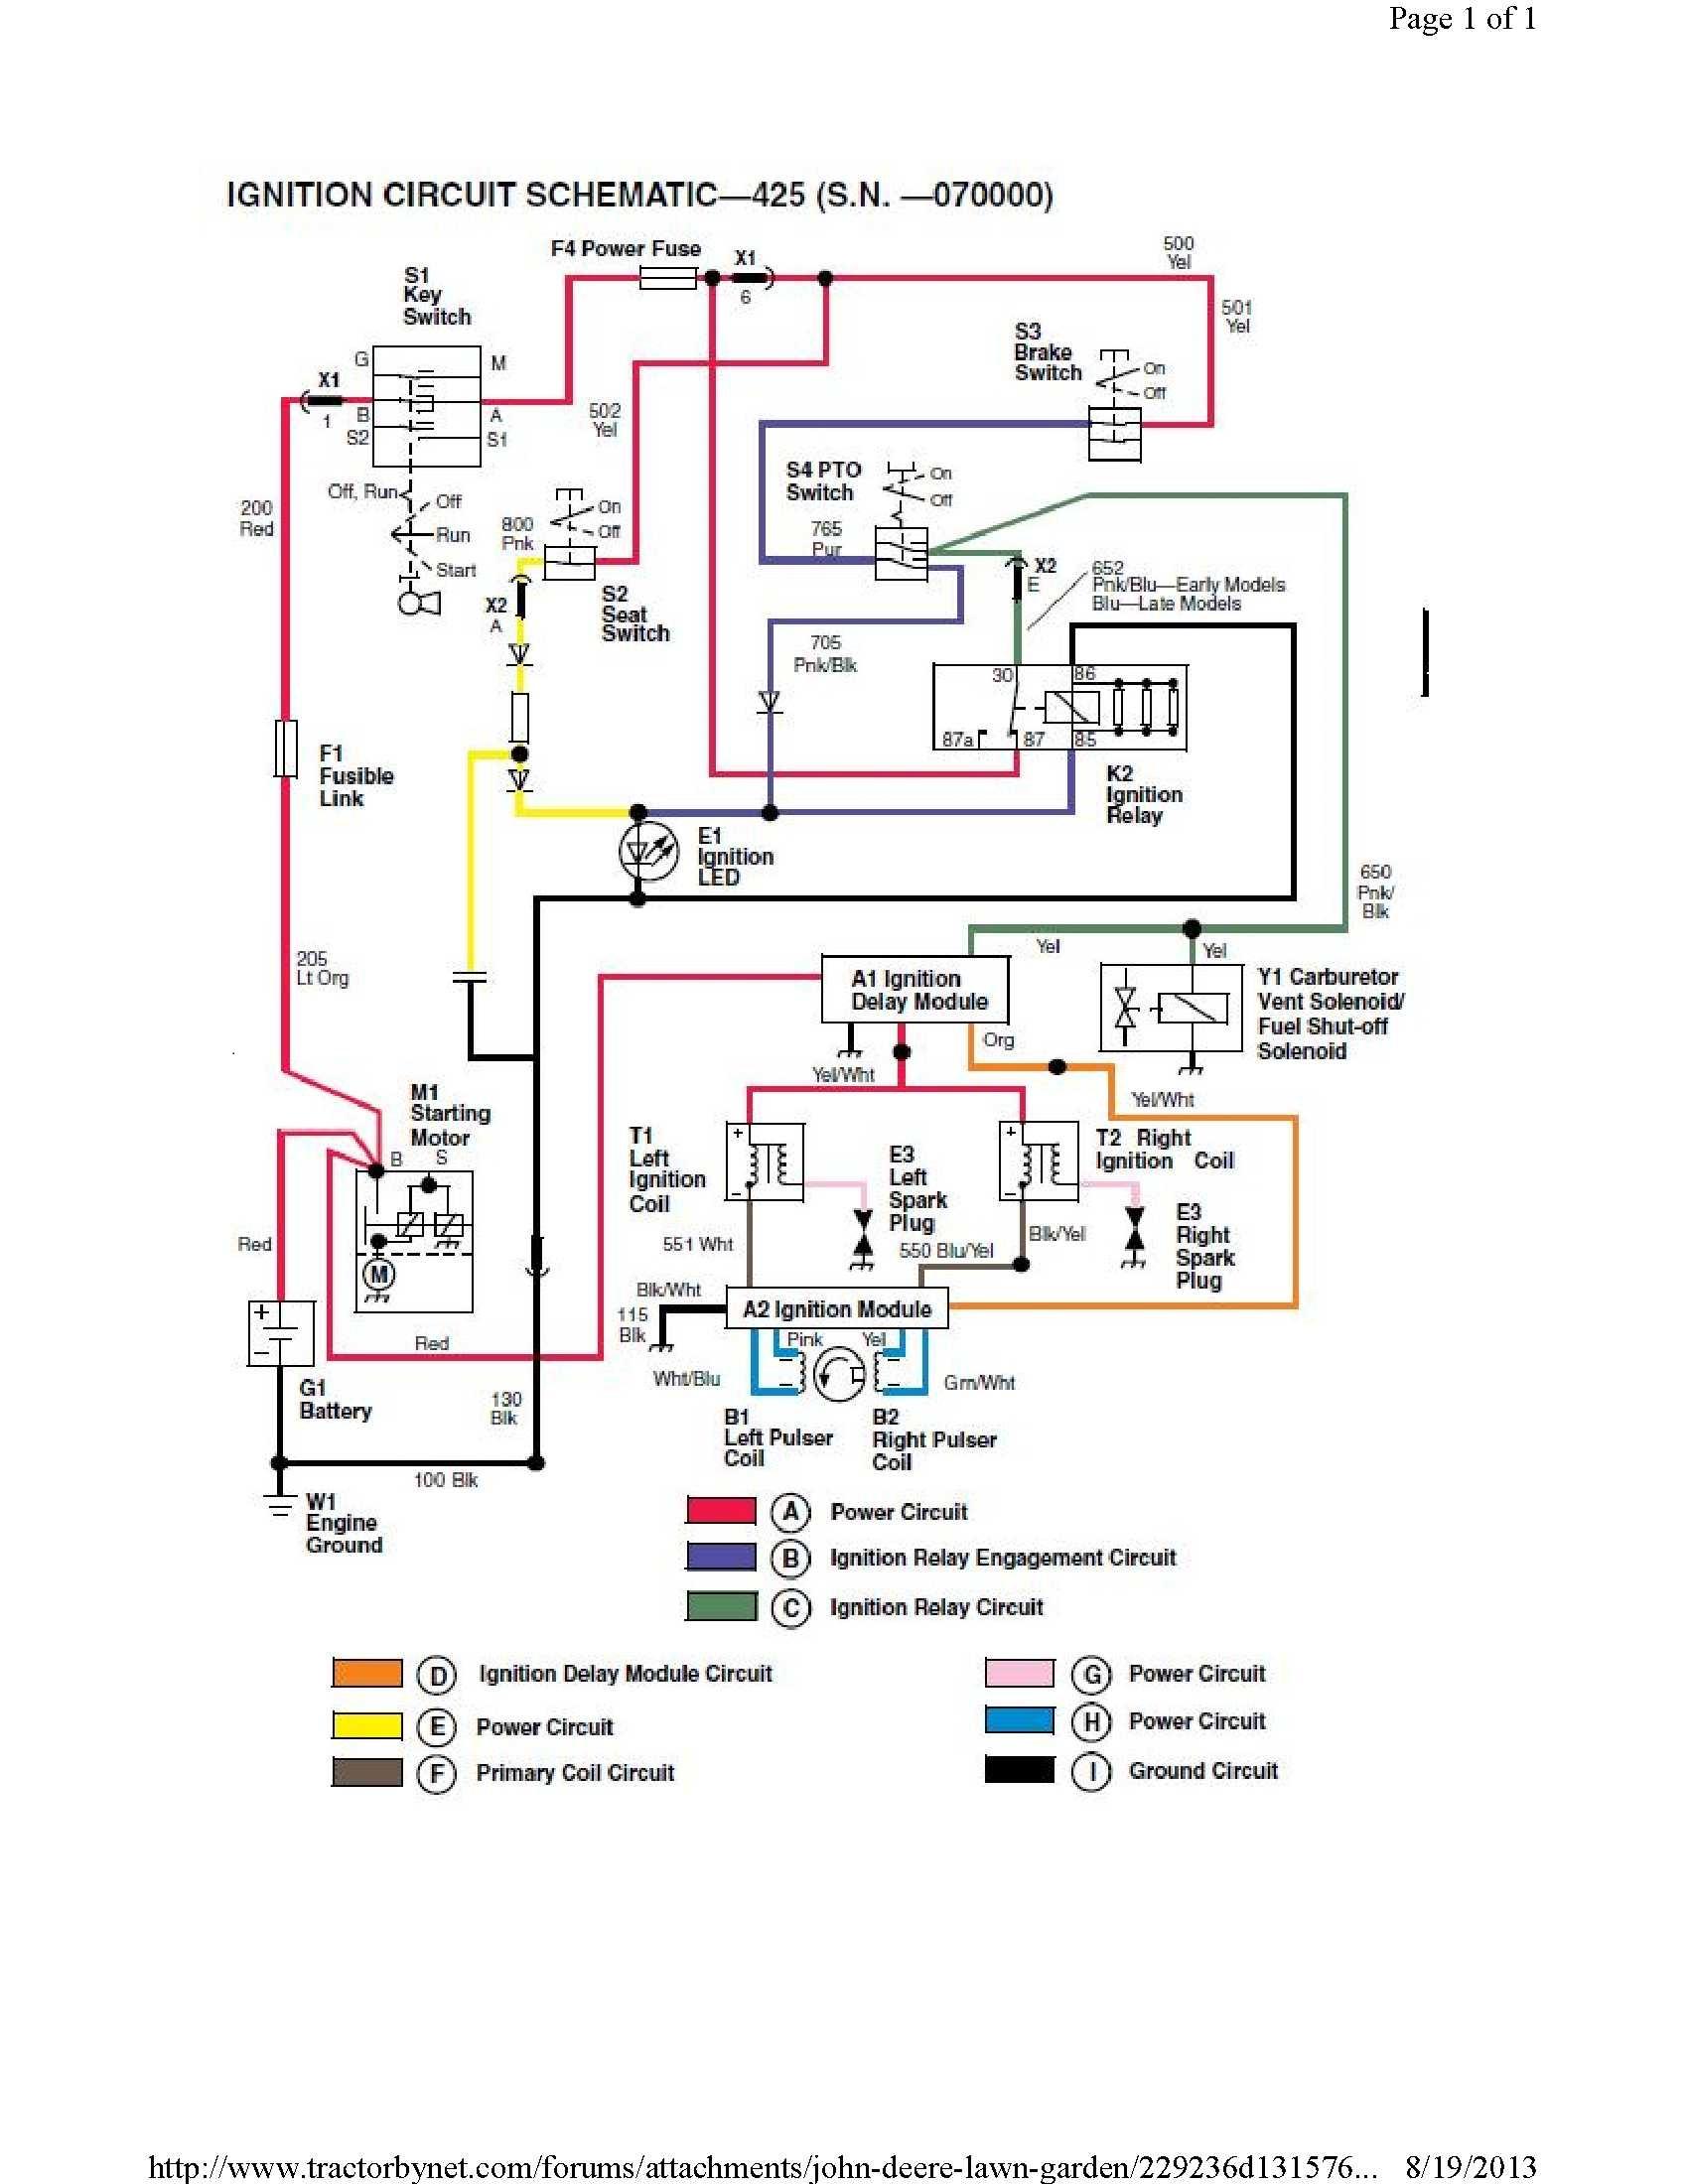 gem e825 wiring diagram l110 wiring diagram john deere eztrak z425 wiring diagram john wiring diagrams description john deere z425